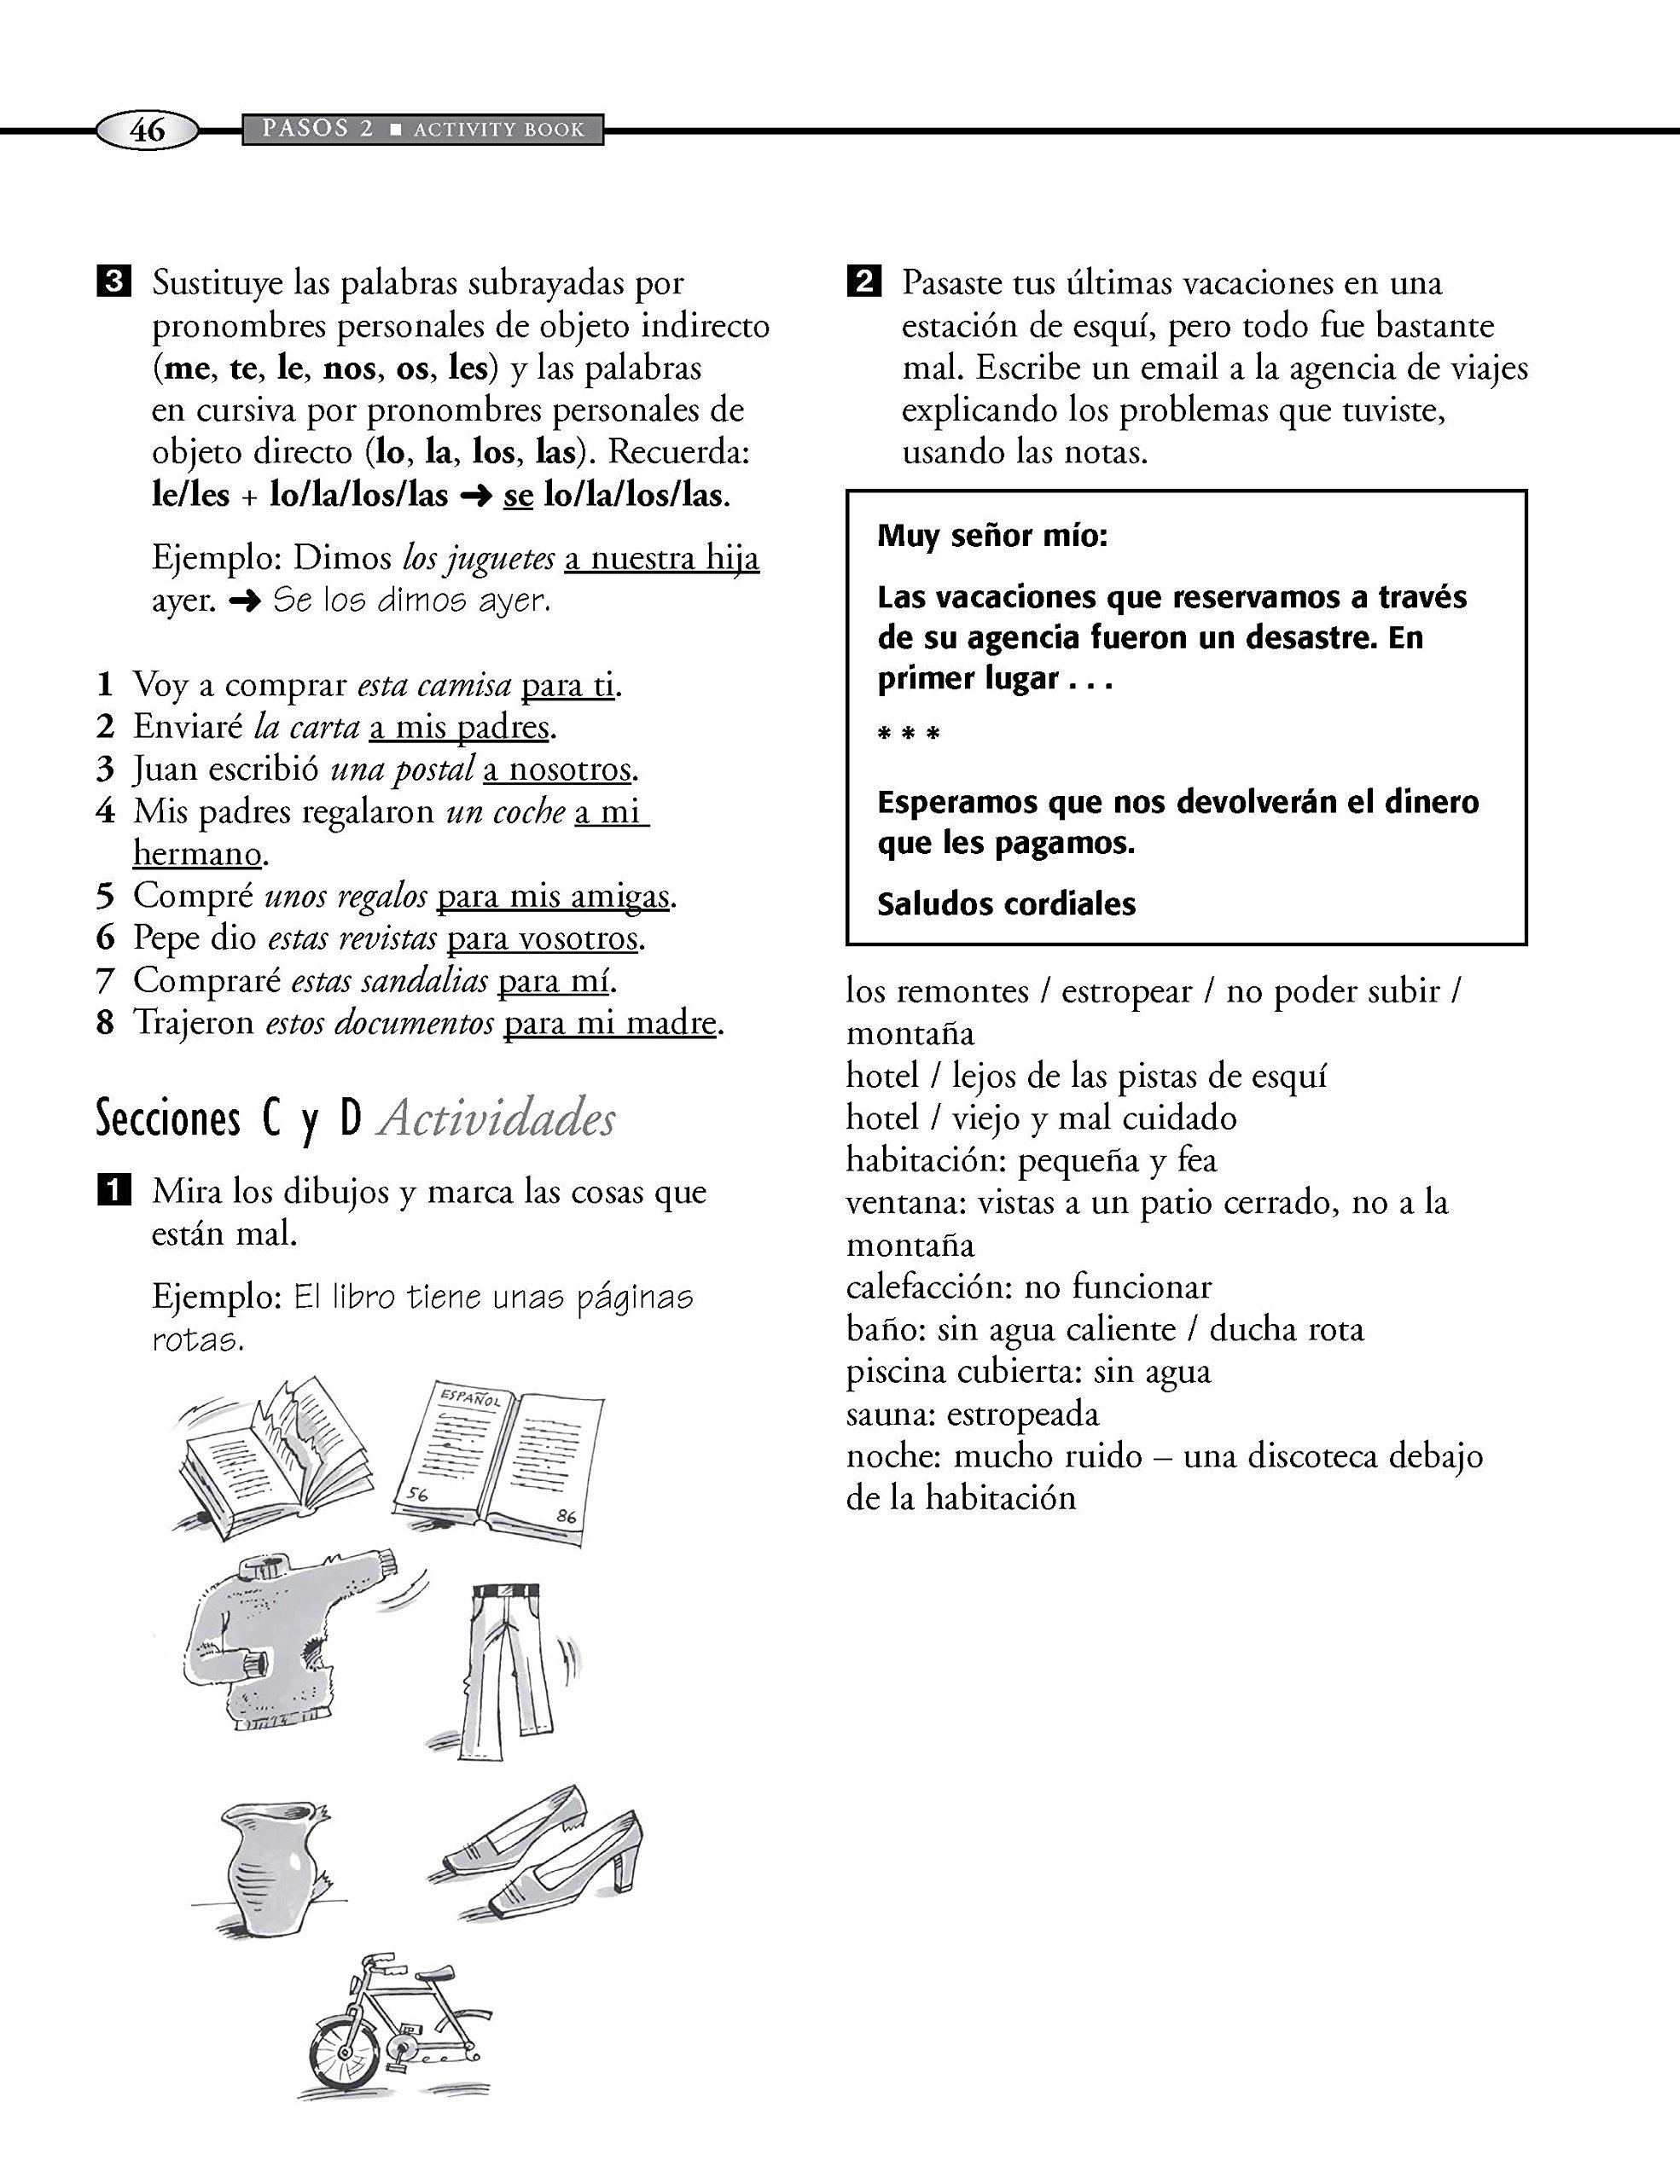 Pasos 2 Fourth Edition Spanish Intermediate Course: Activity Book: Amazon.es: Martyn Ellis, Rosa Maria Martin: Libros en idiomas extranjeros